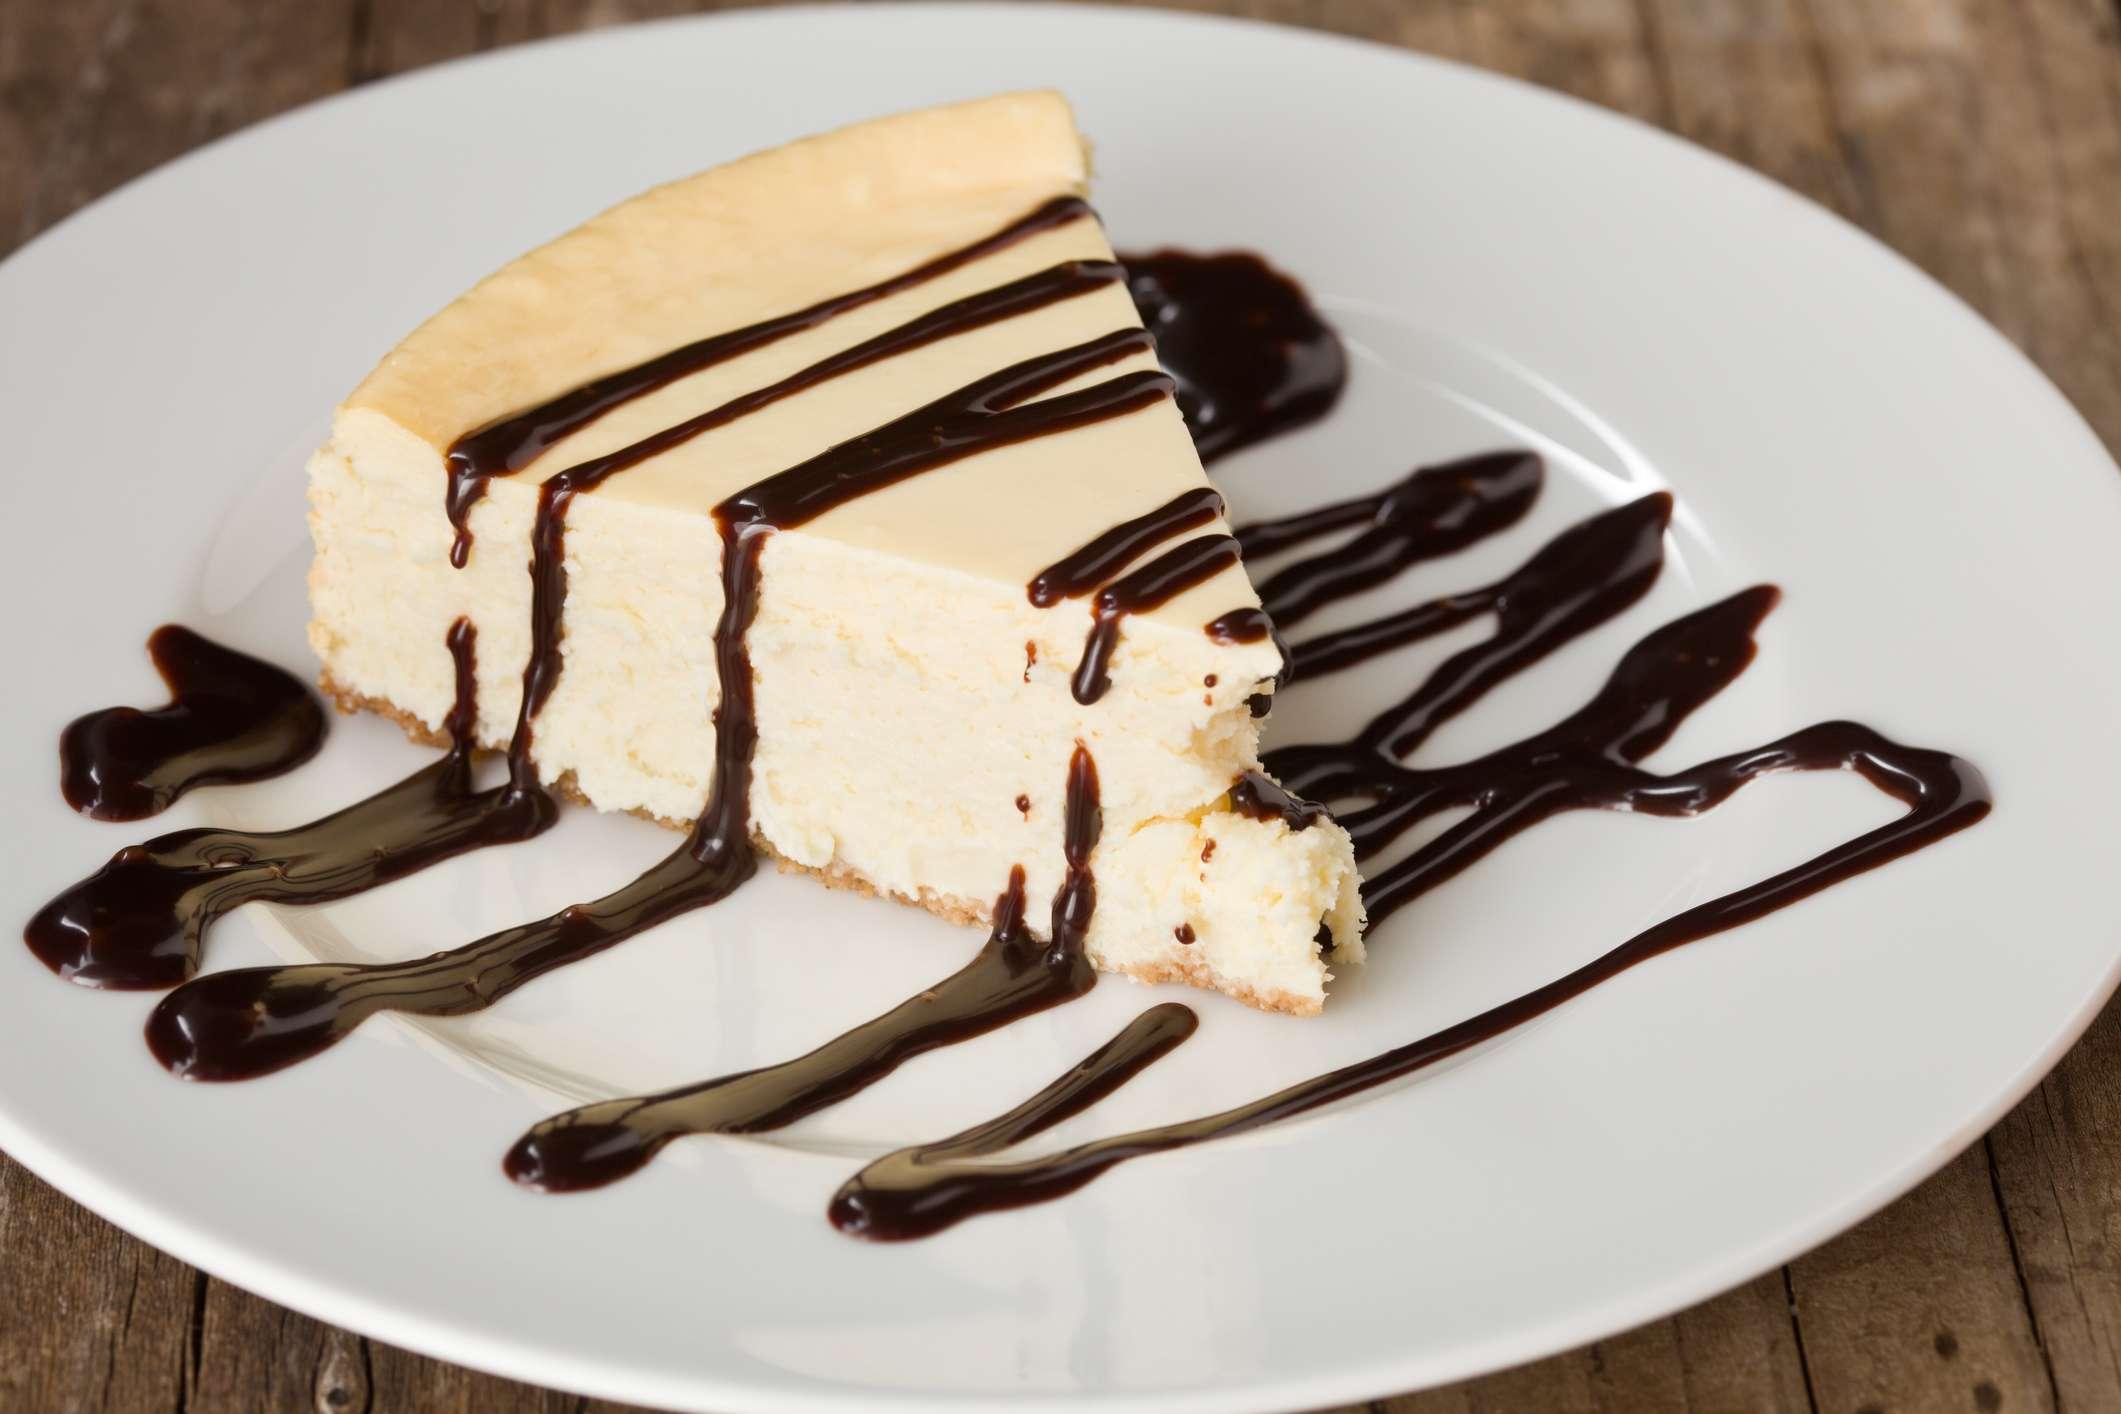 Slice Of cheesecake with chocolate ganache